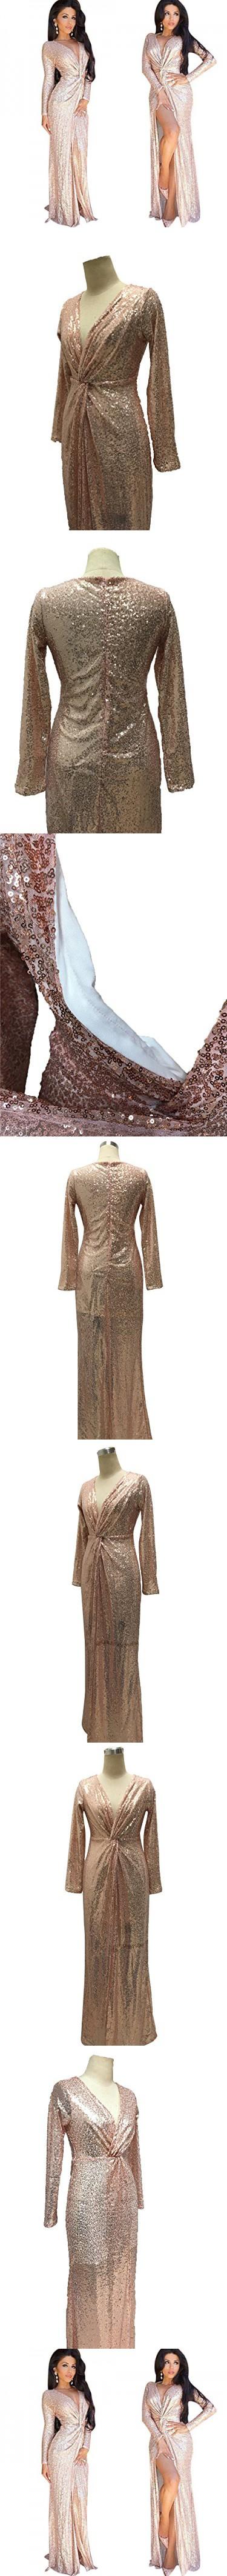 Moxeay women rose gold sequined vneck longsleeved high sliting